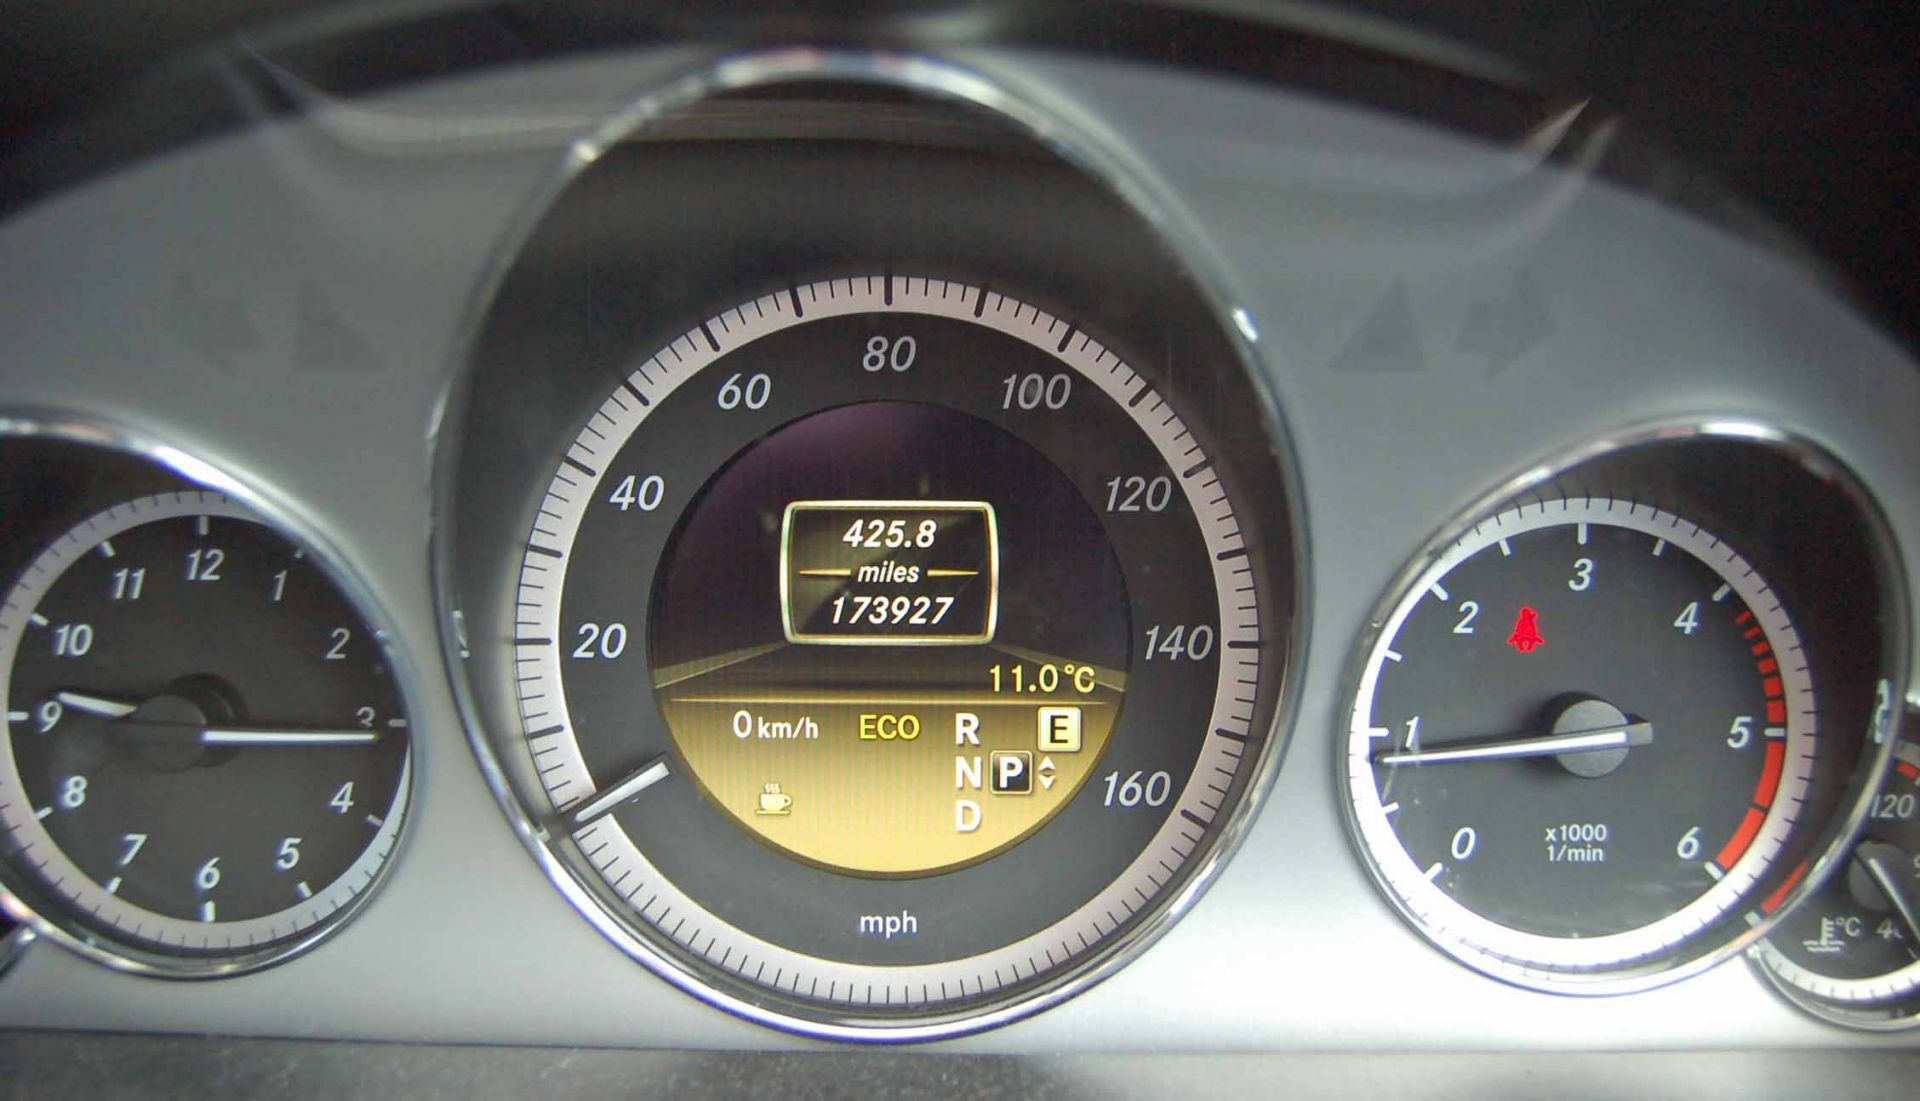 Lot 9 - A MERCEDES BENZ E250 Avantgarde 2.2 CDI Blue Efficiency 5-Door, Automatic, Diesel Estate Car,